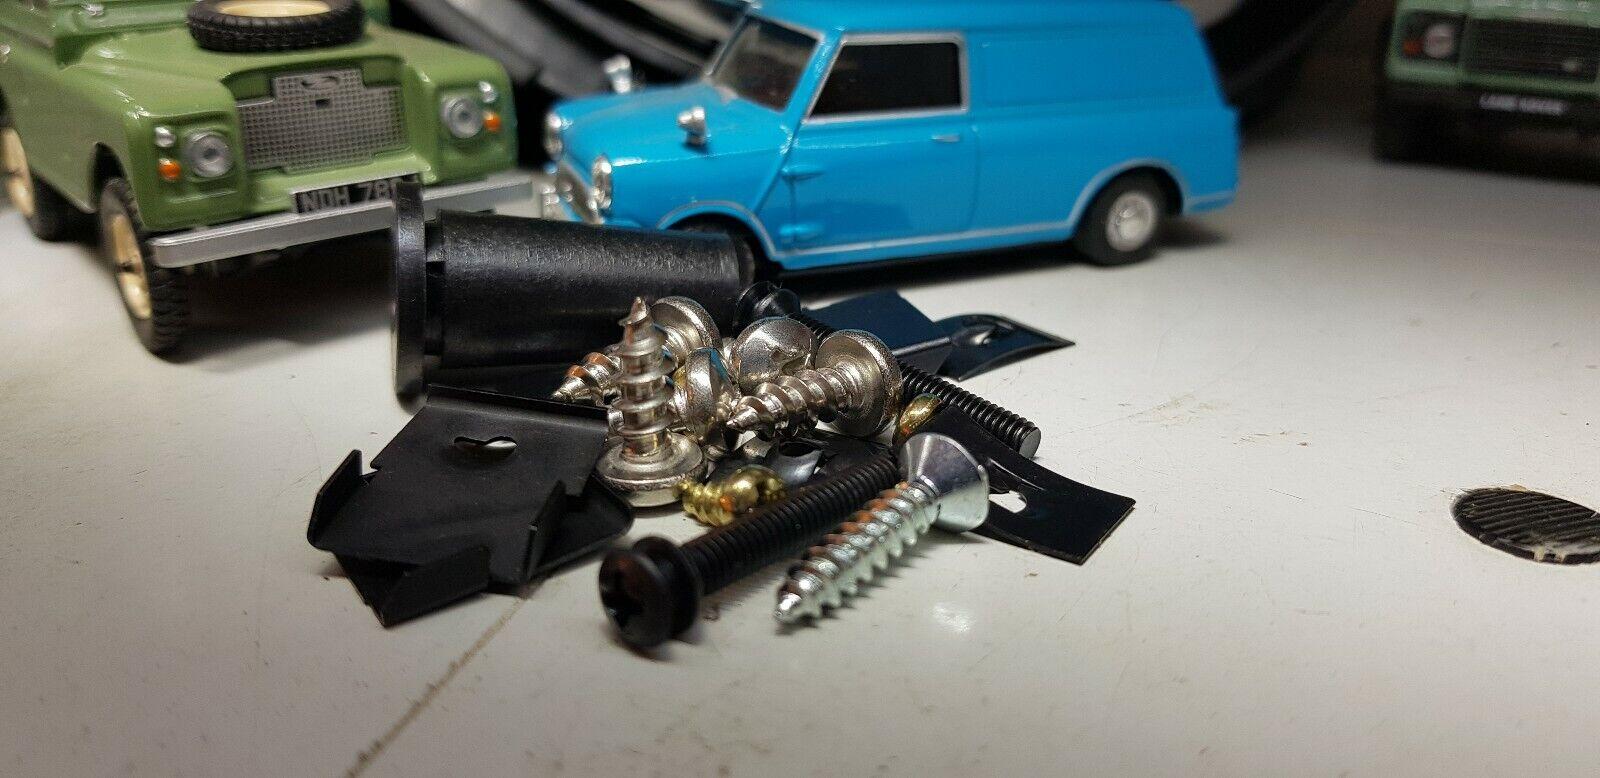 BS 16200 LBS Tow Strap V Strap 3/'/'x24/'/' Legs 3Ply Mini J Hooks WLL 5400LBS